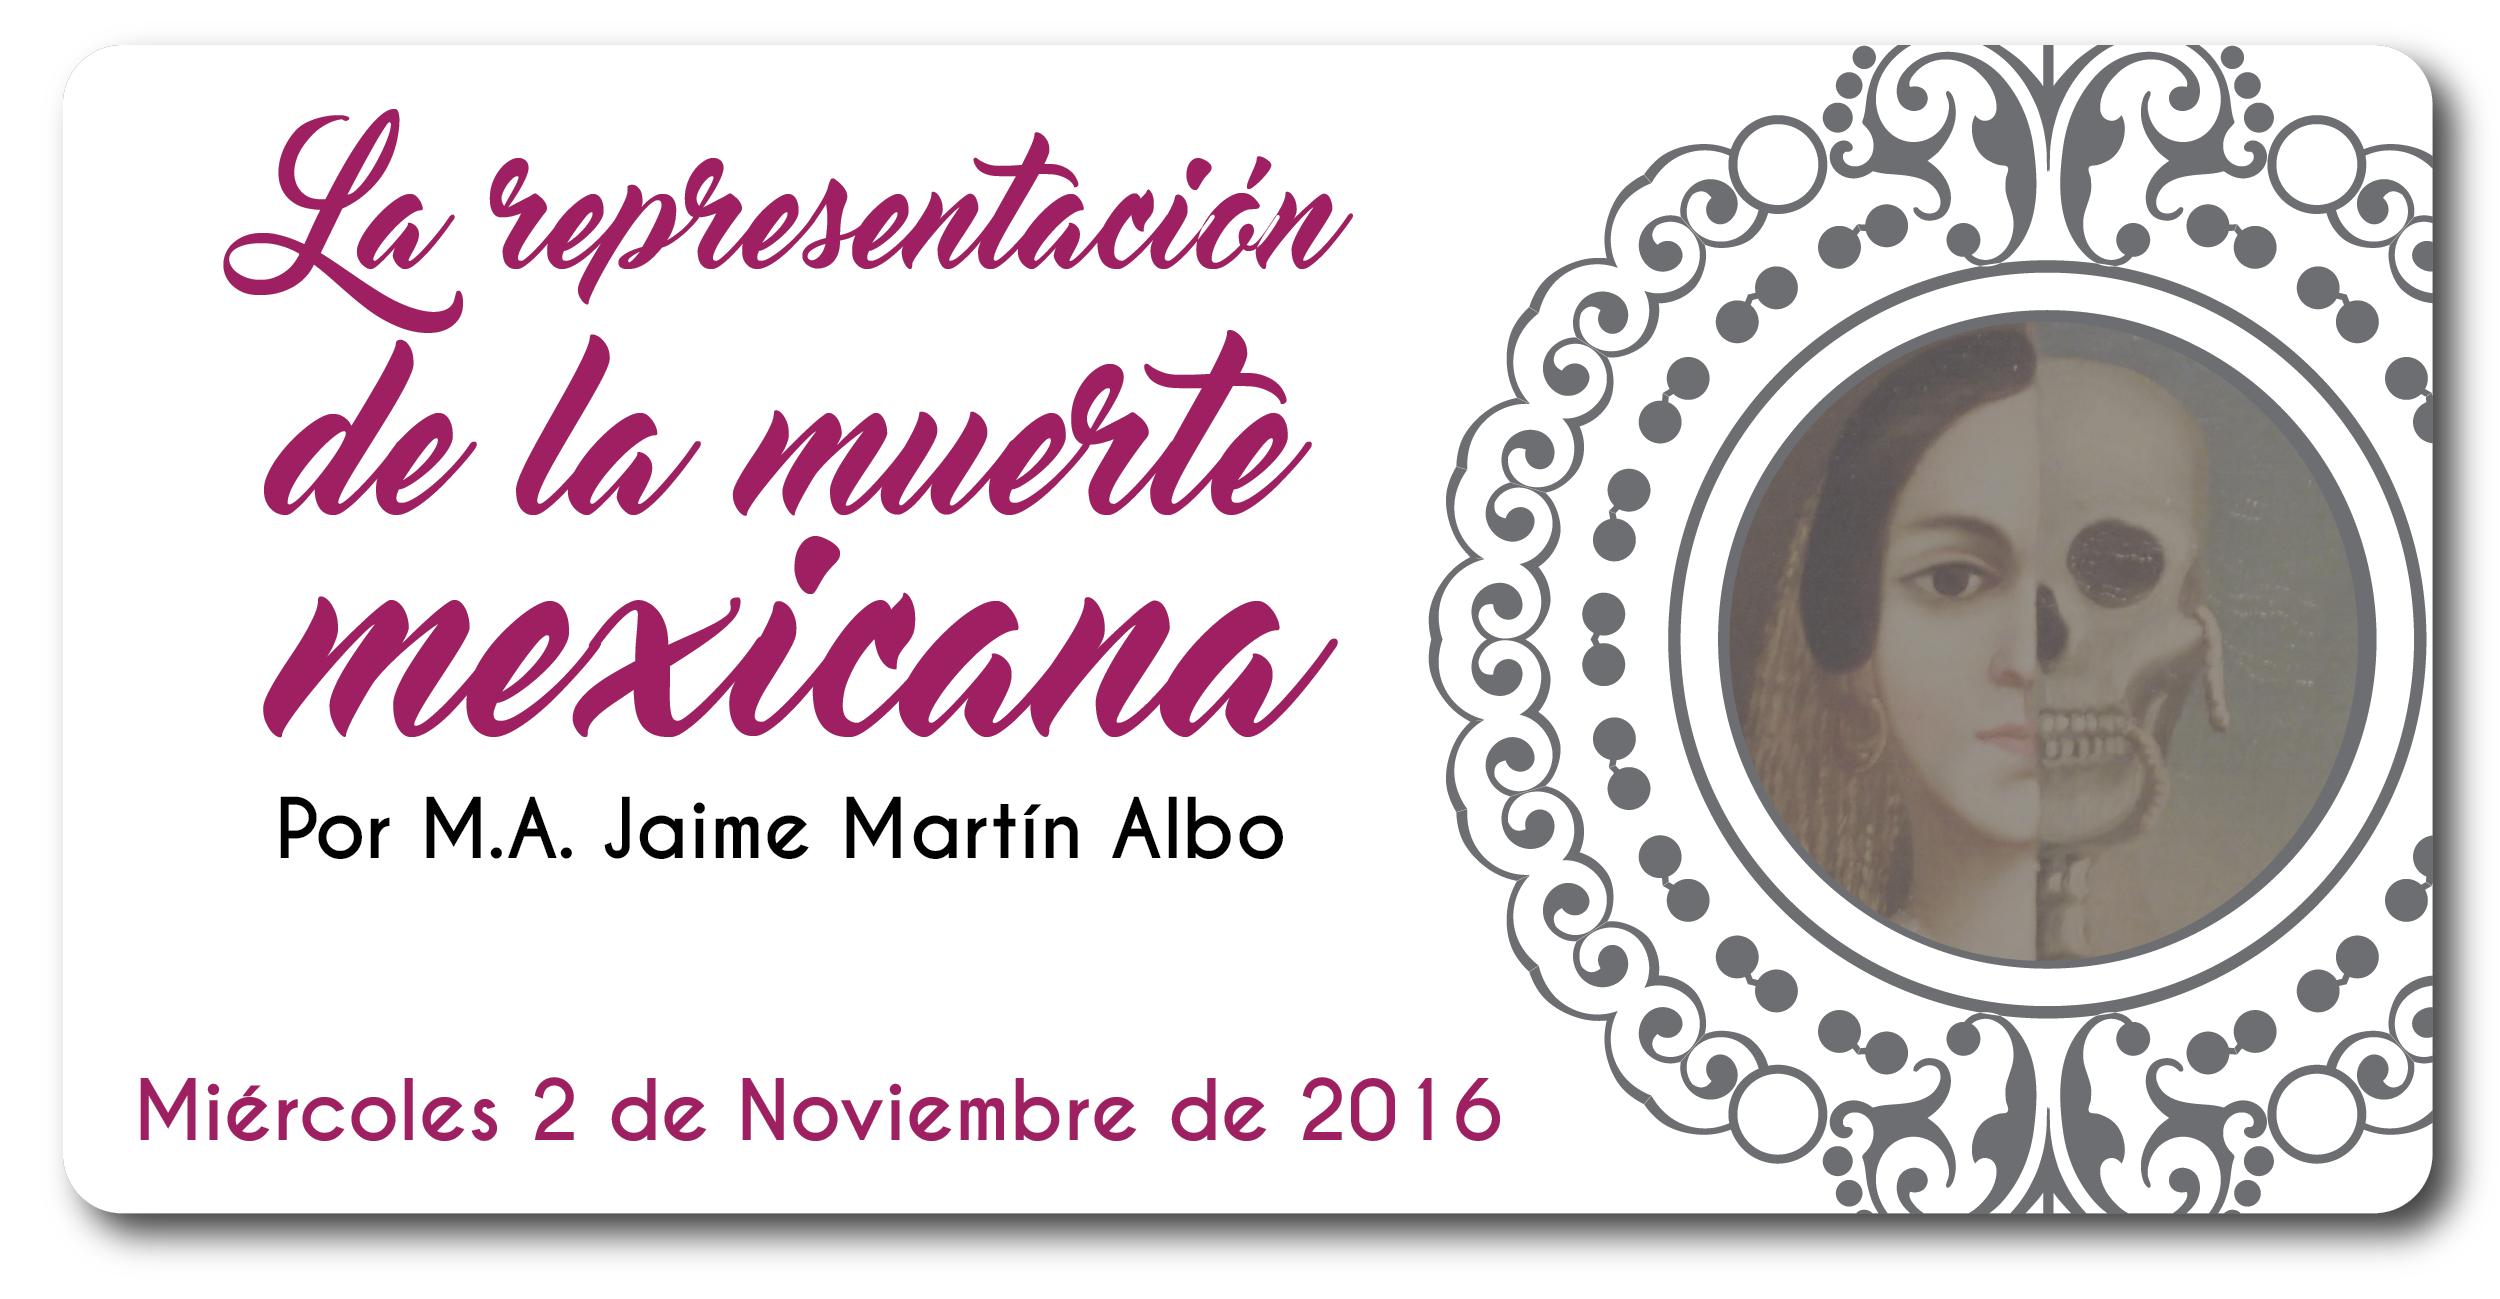 boton-platica-representacion-de-la-muerte-mexicana